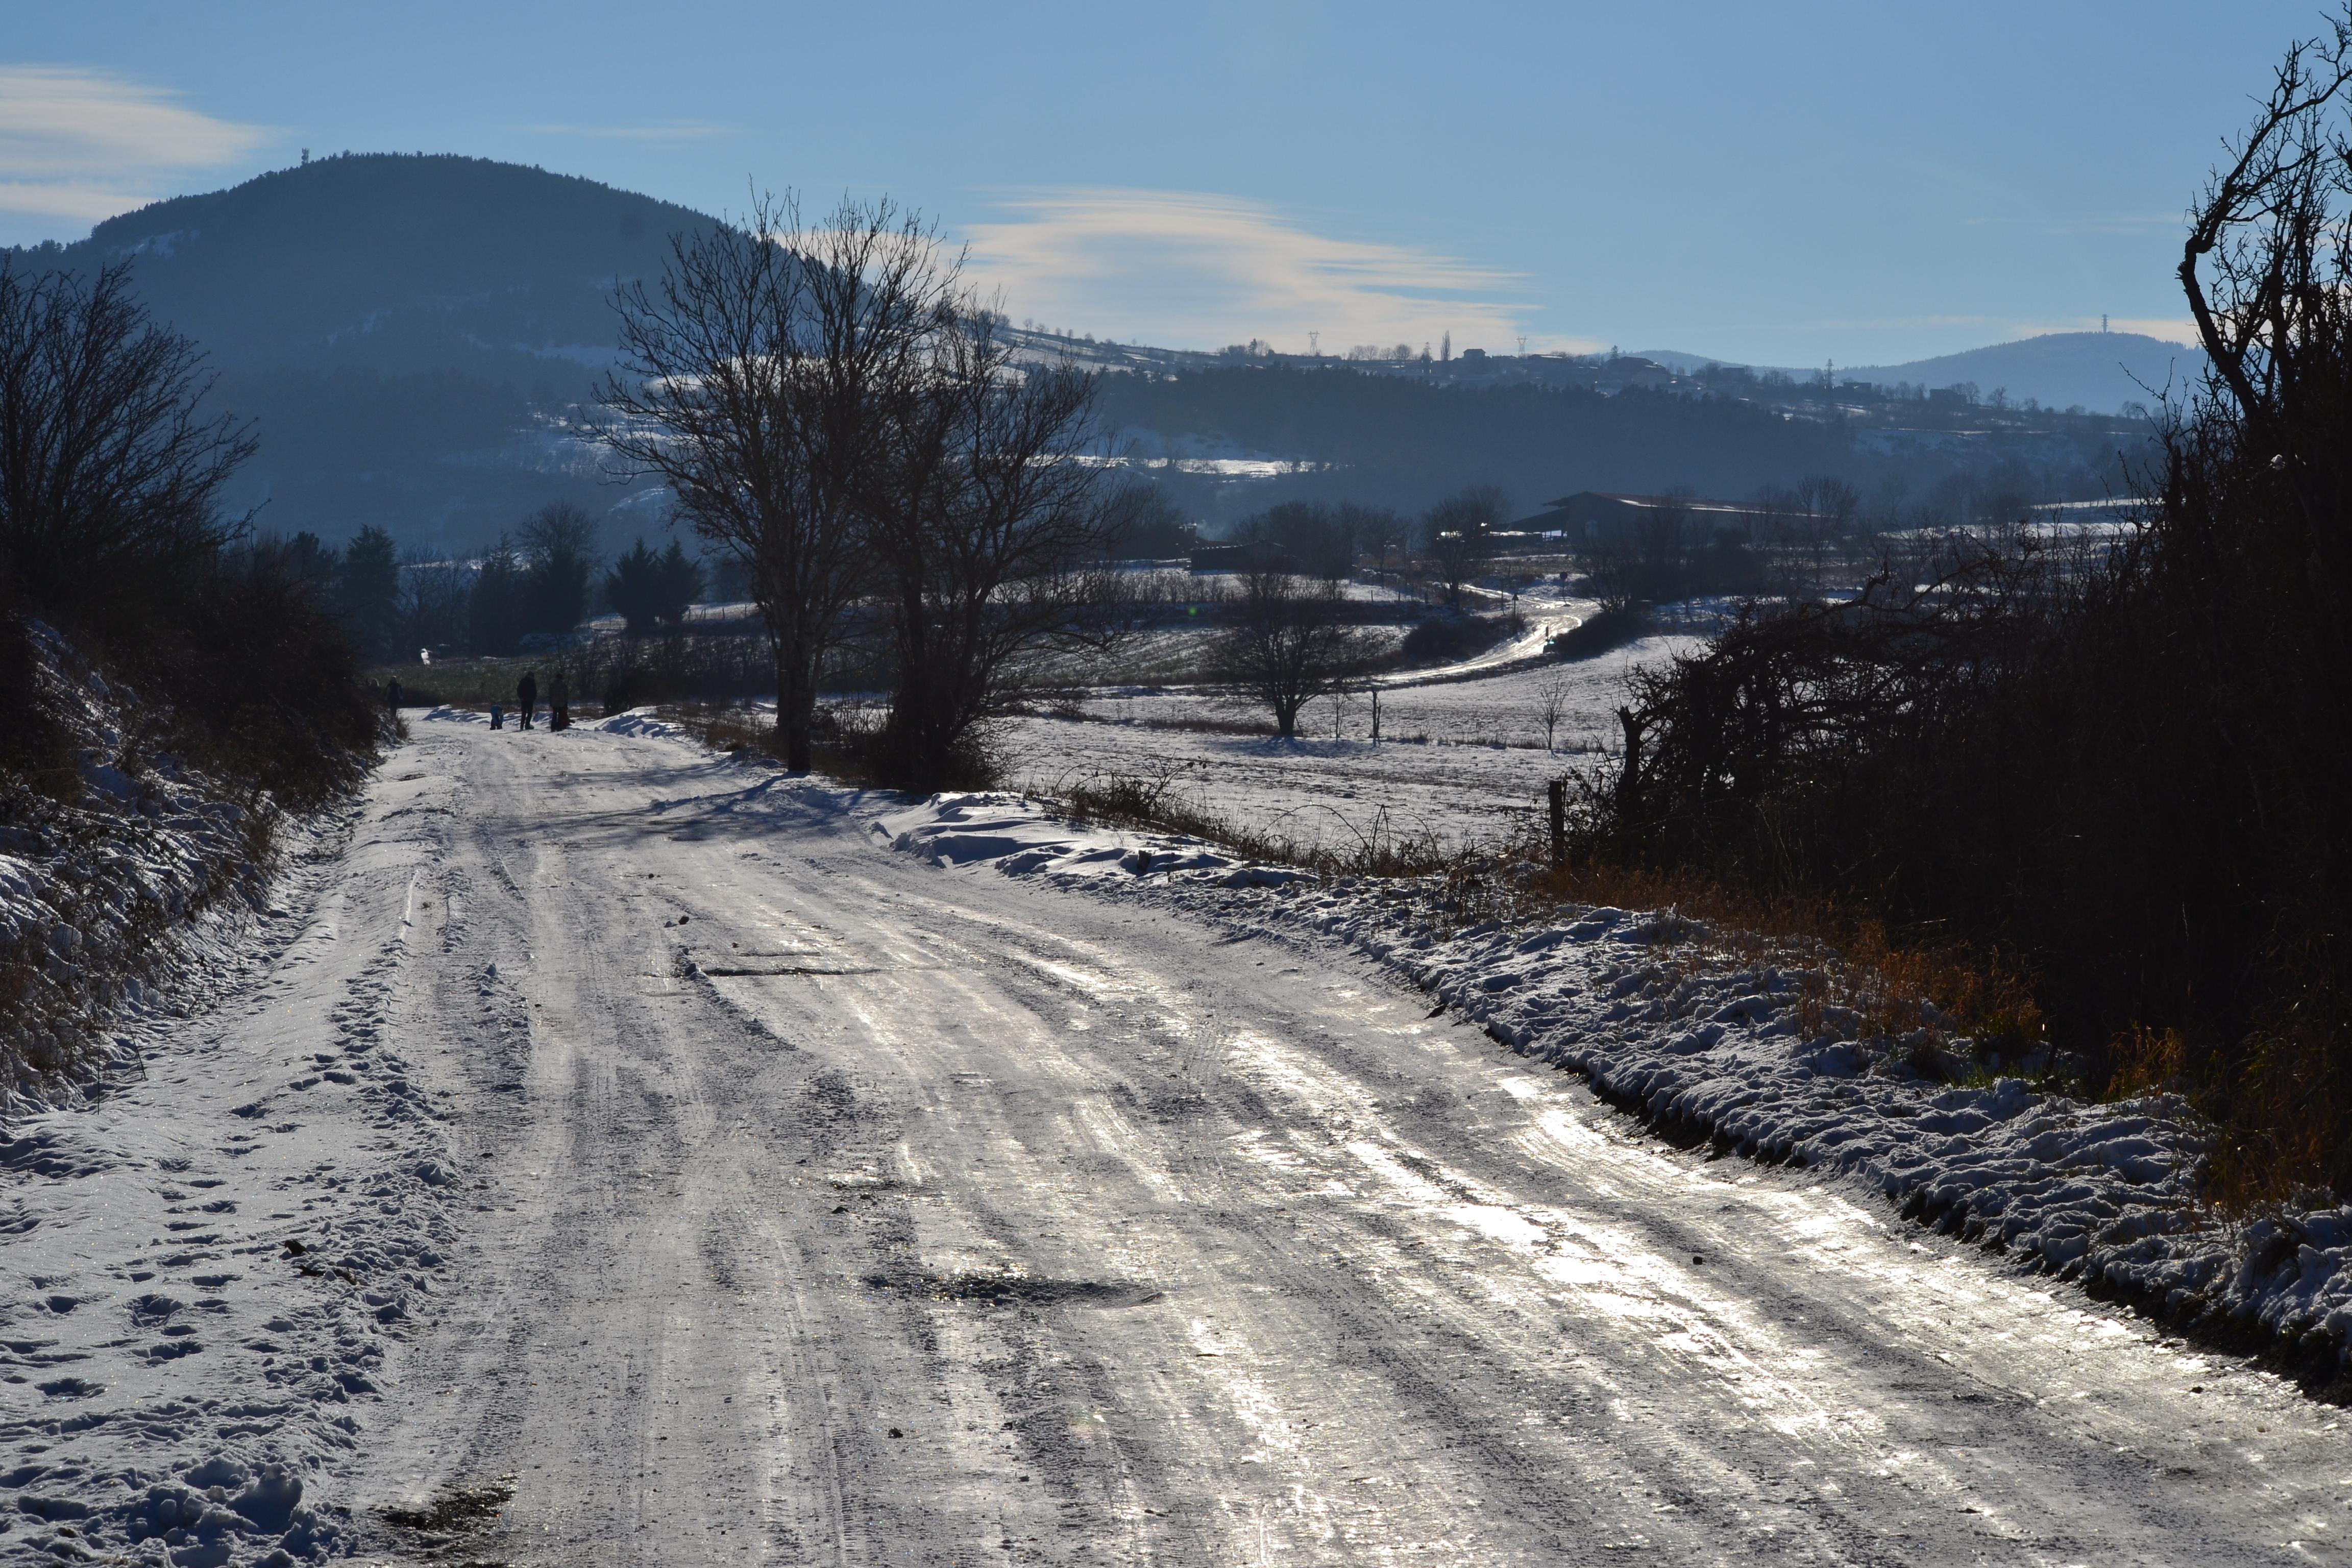 Neige et ballade au Puy-en-Velay